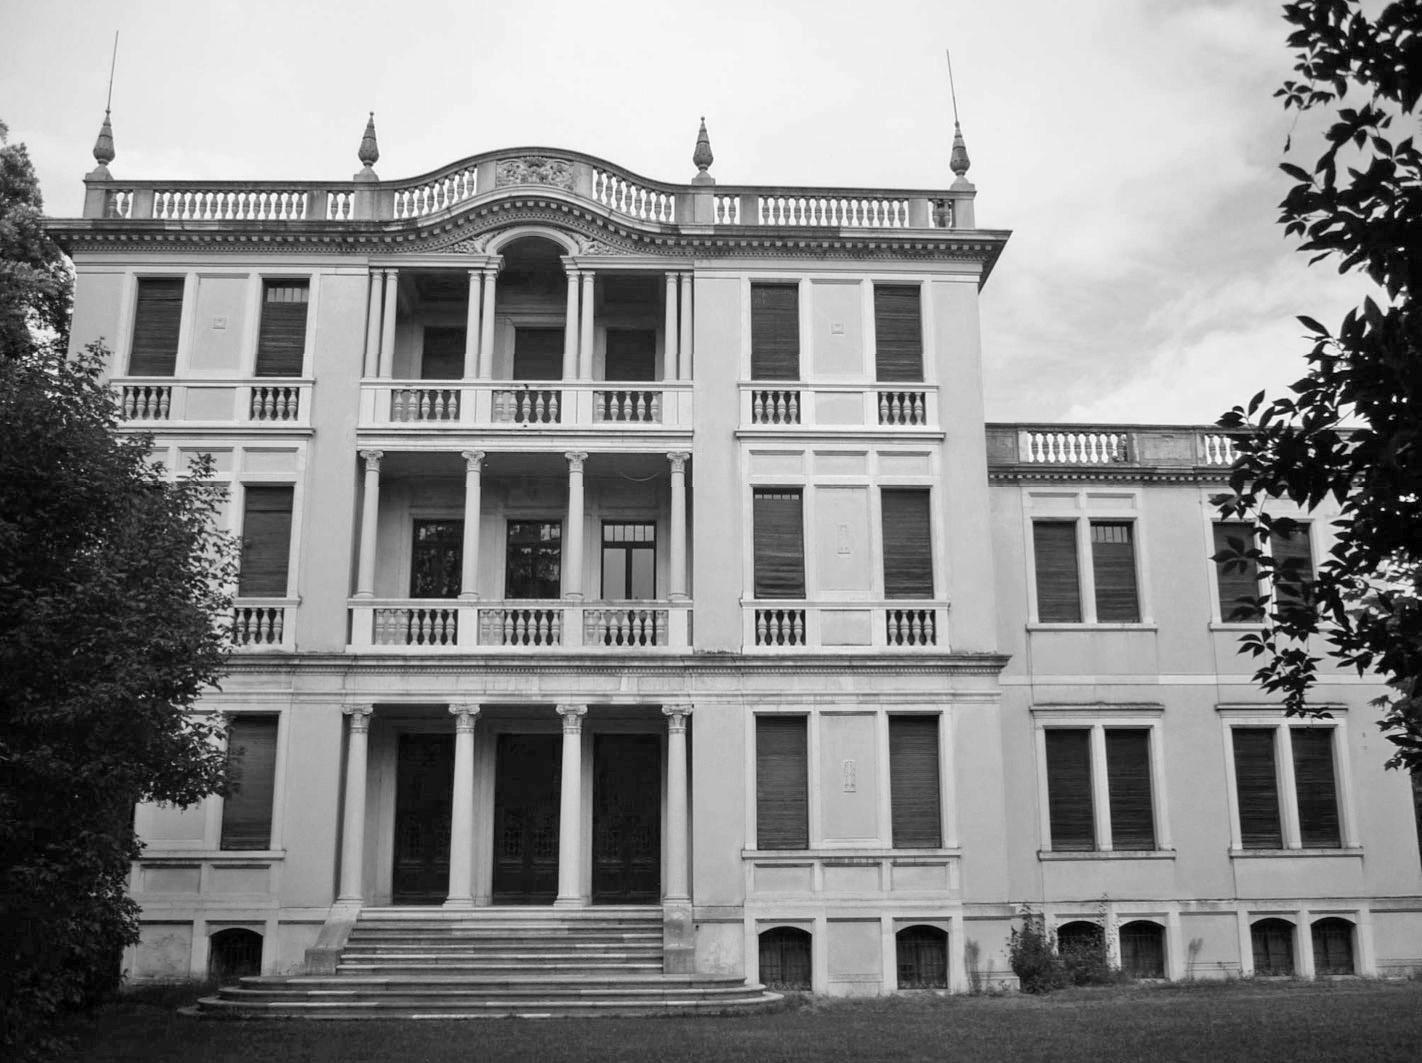 Villa Ca' zorzi in Noventa di Piave – Venezia